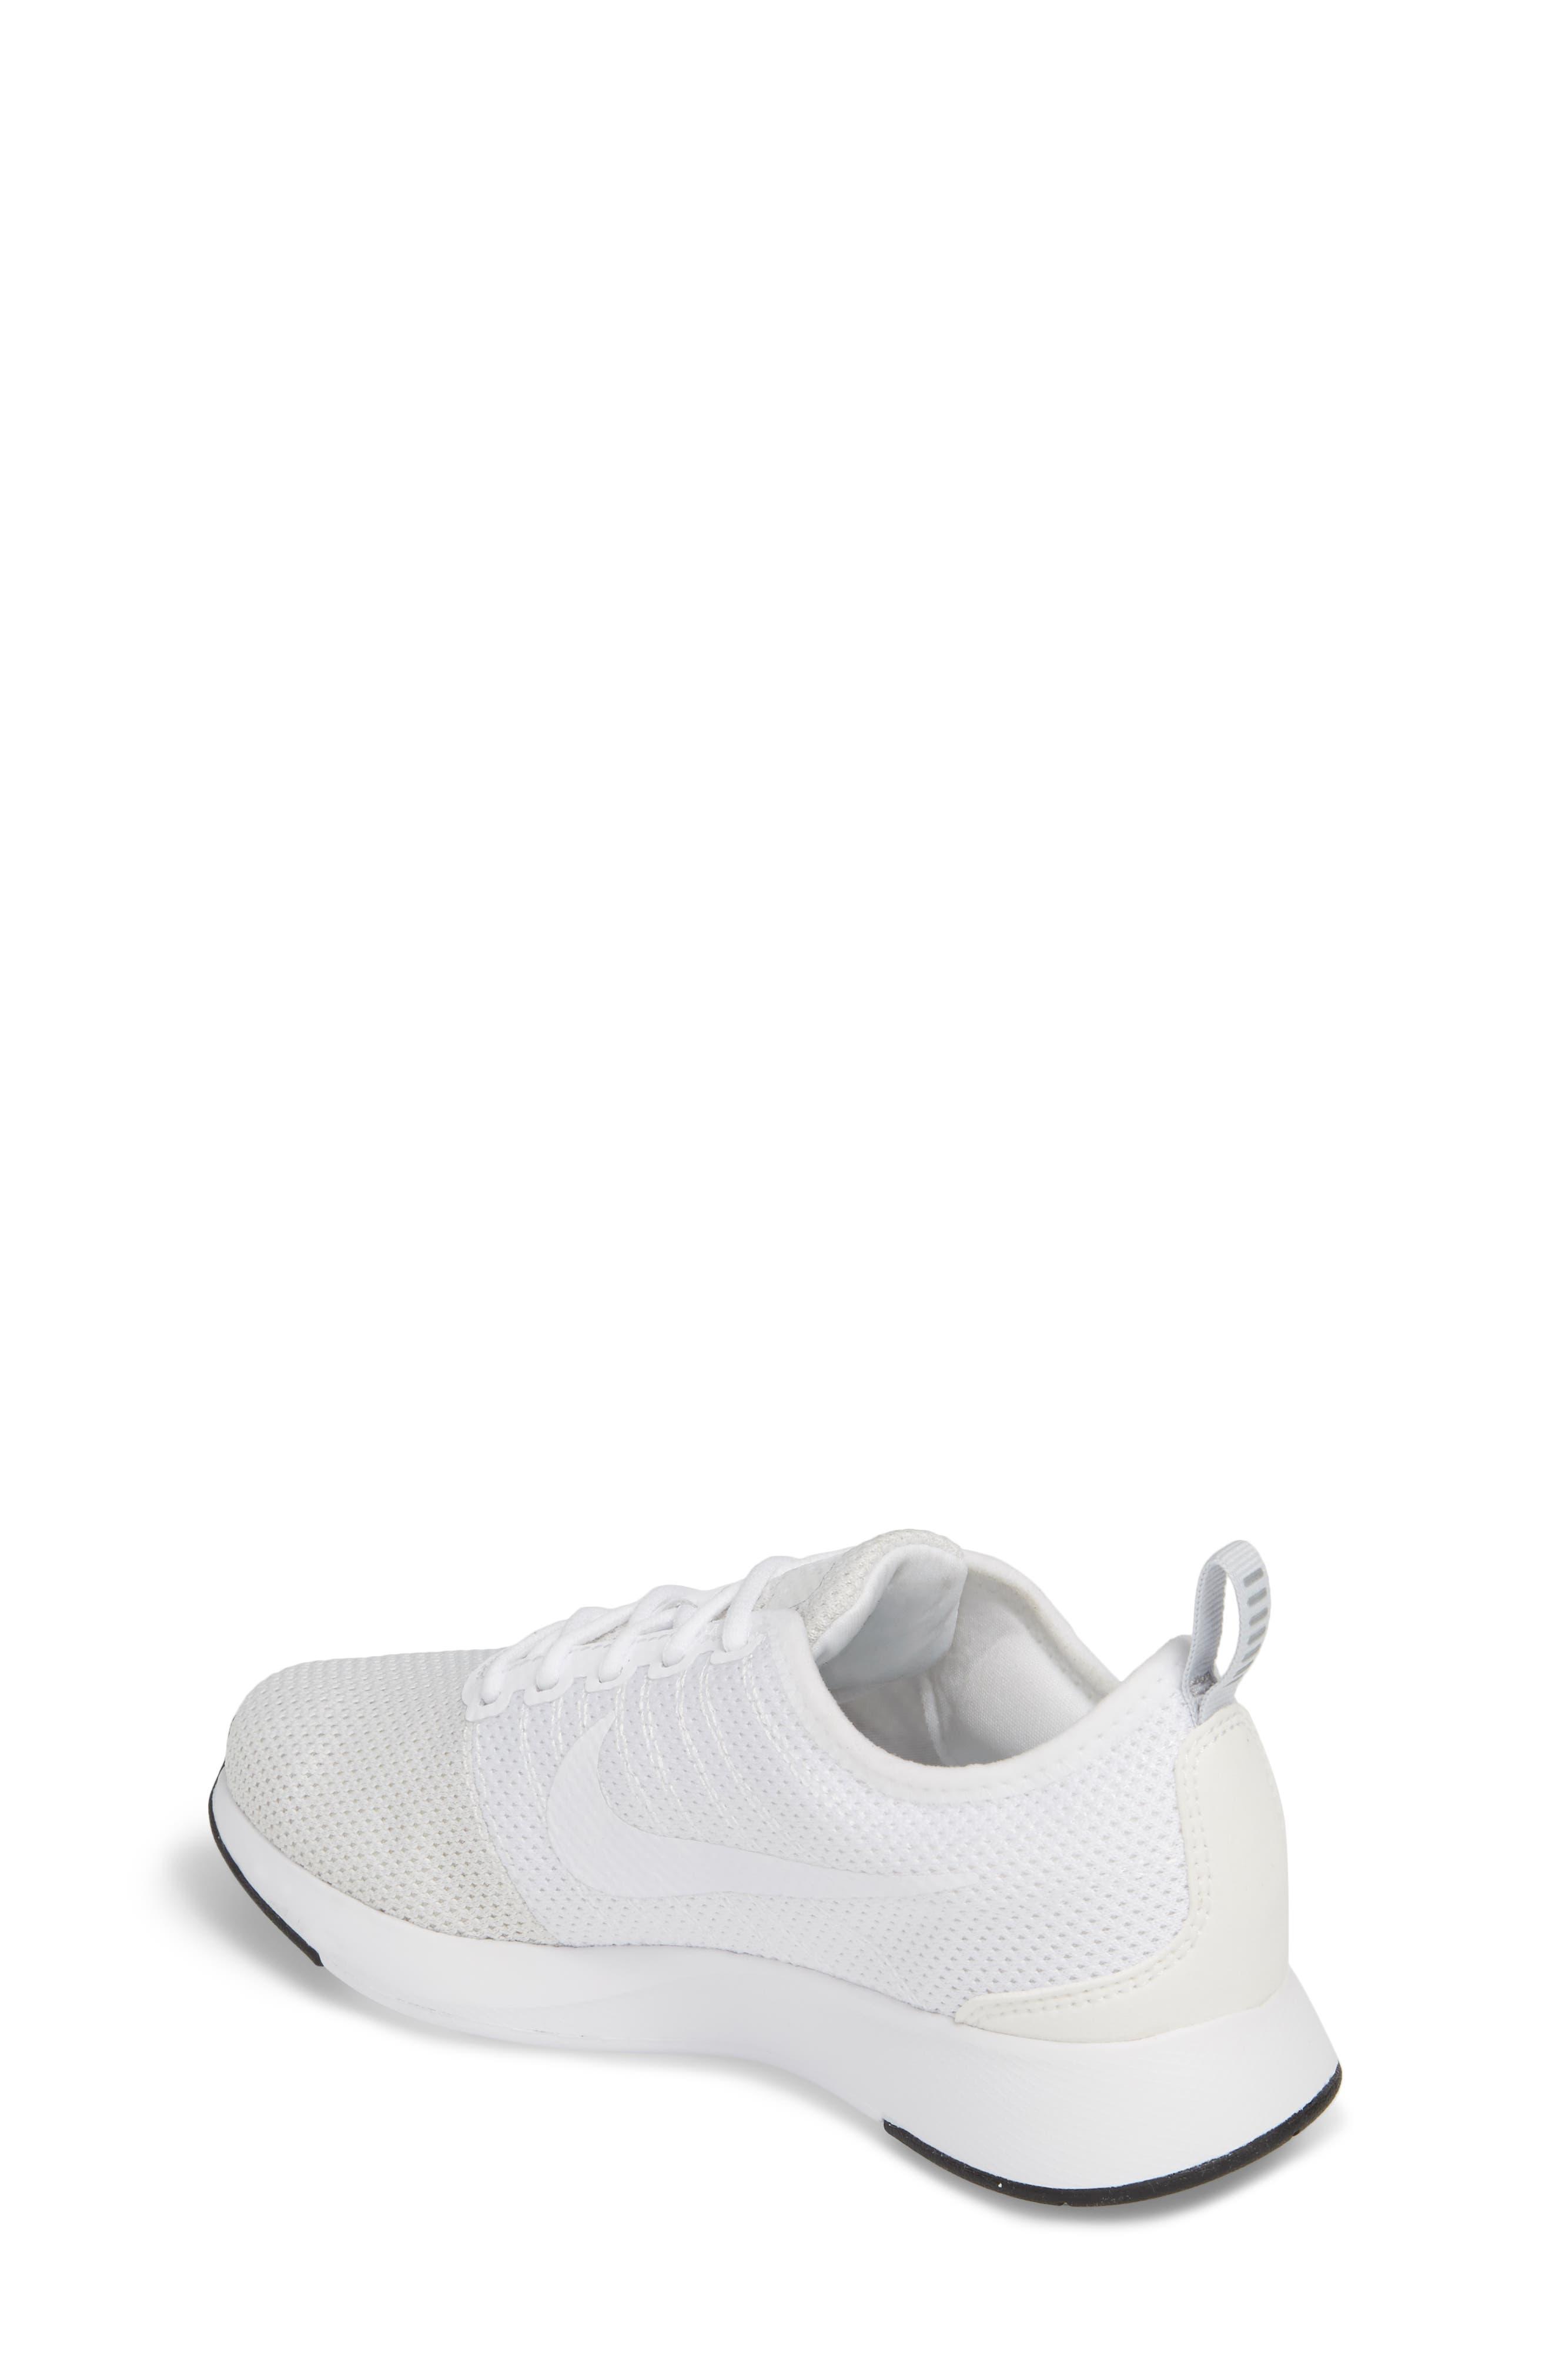 Dualtone Racer GS Sneaker,                             Alternate thumbnail 7, color,